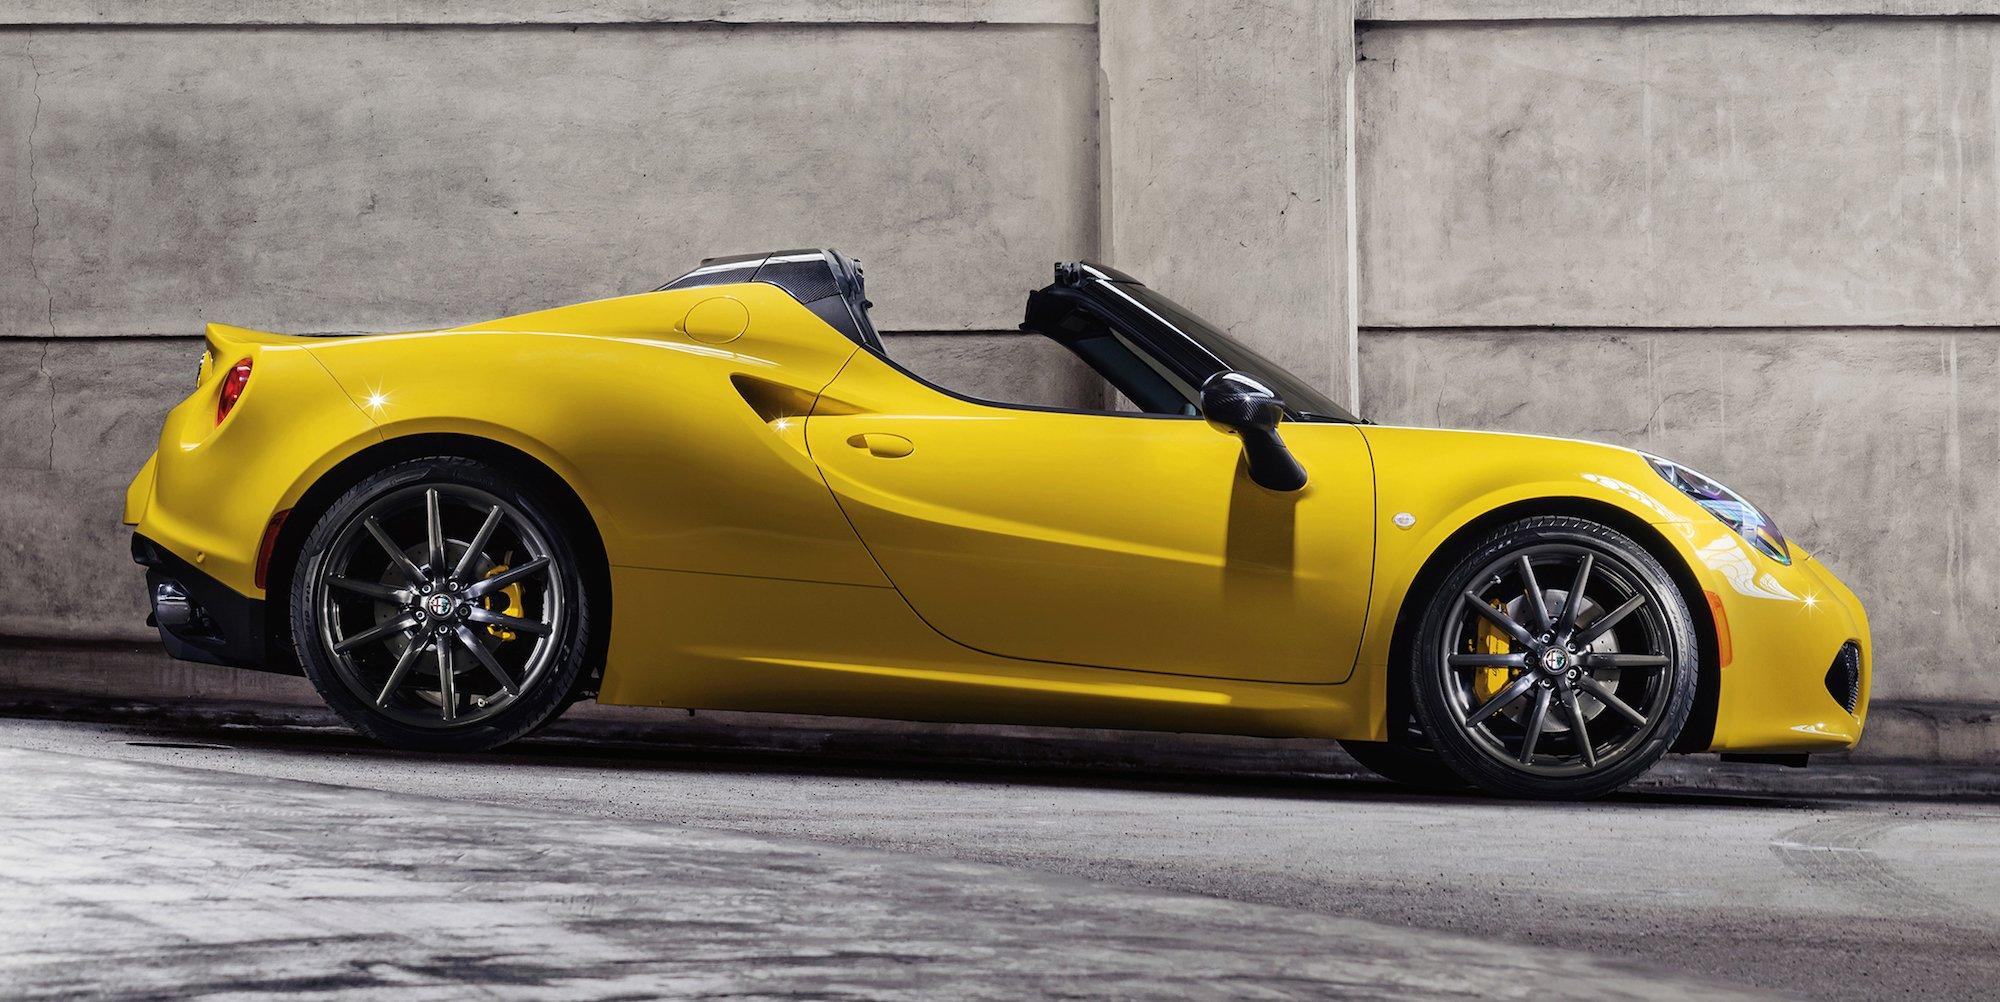 2015 Toyota Supra Price >> Alfa Romeo 4C Spider gets sub-$100K price tag - photos ...